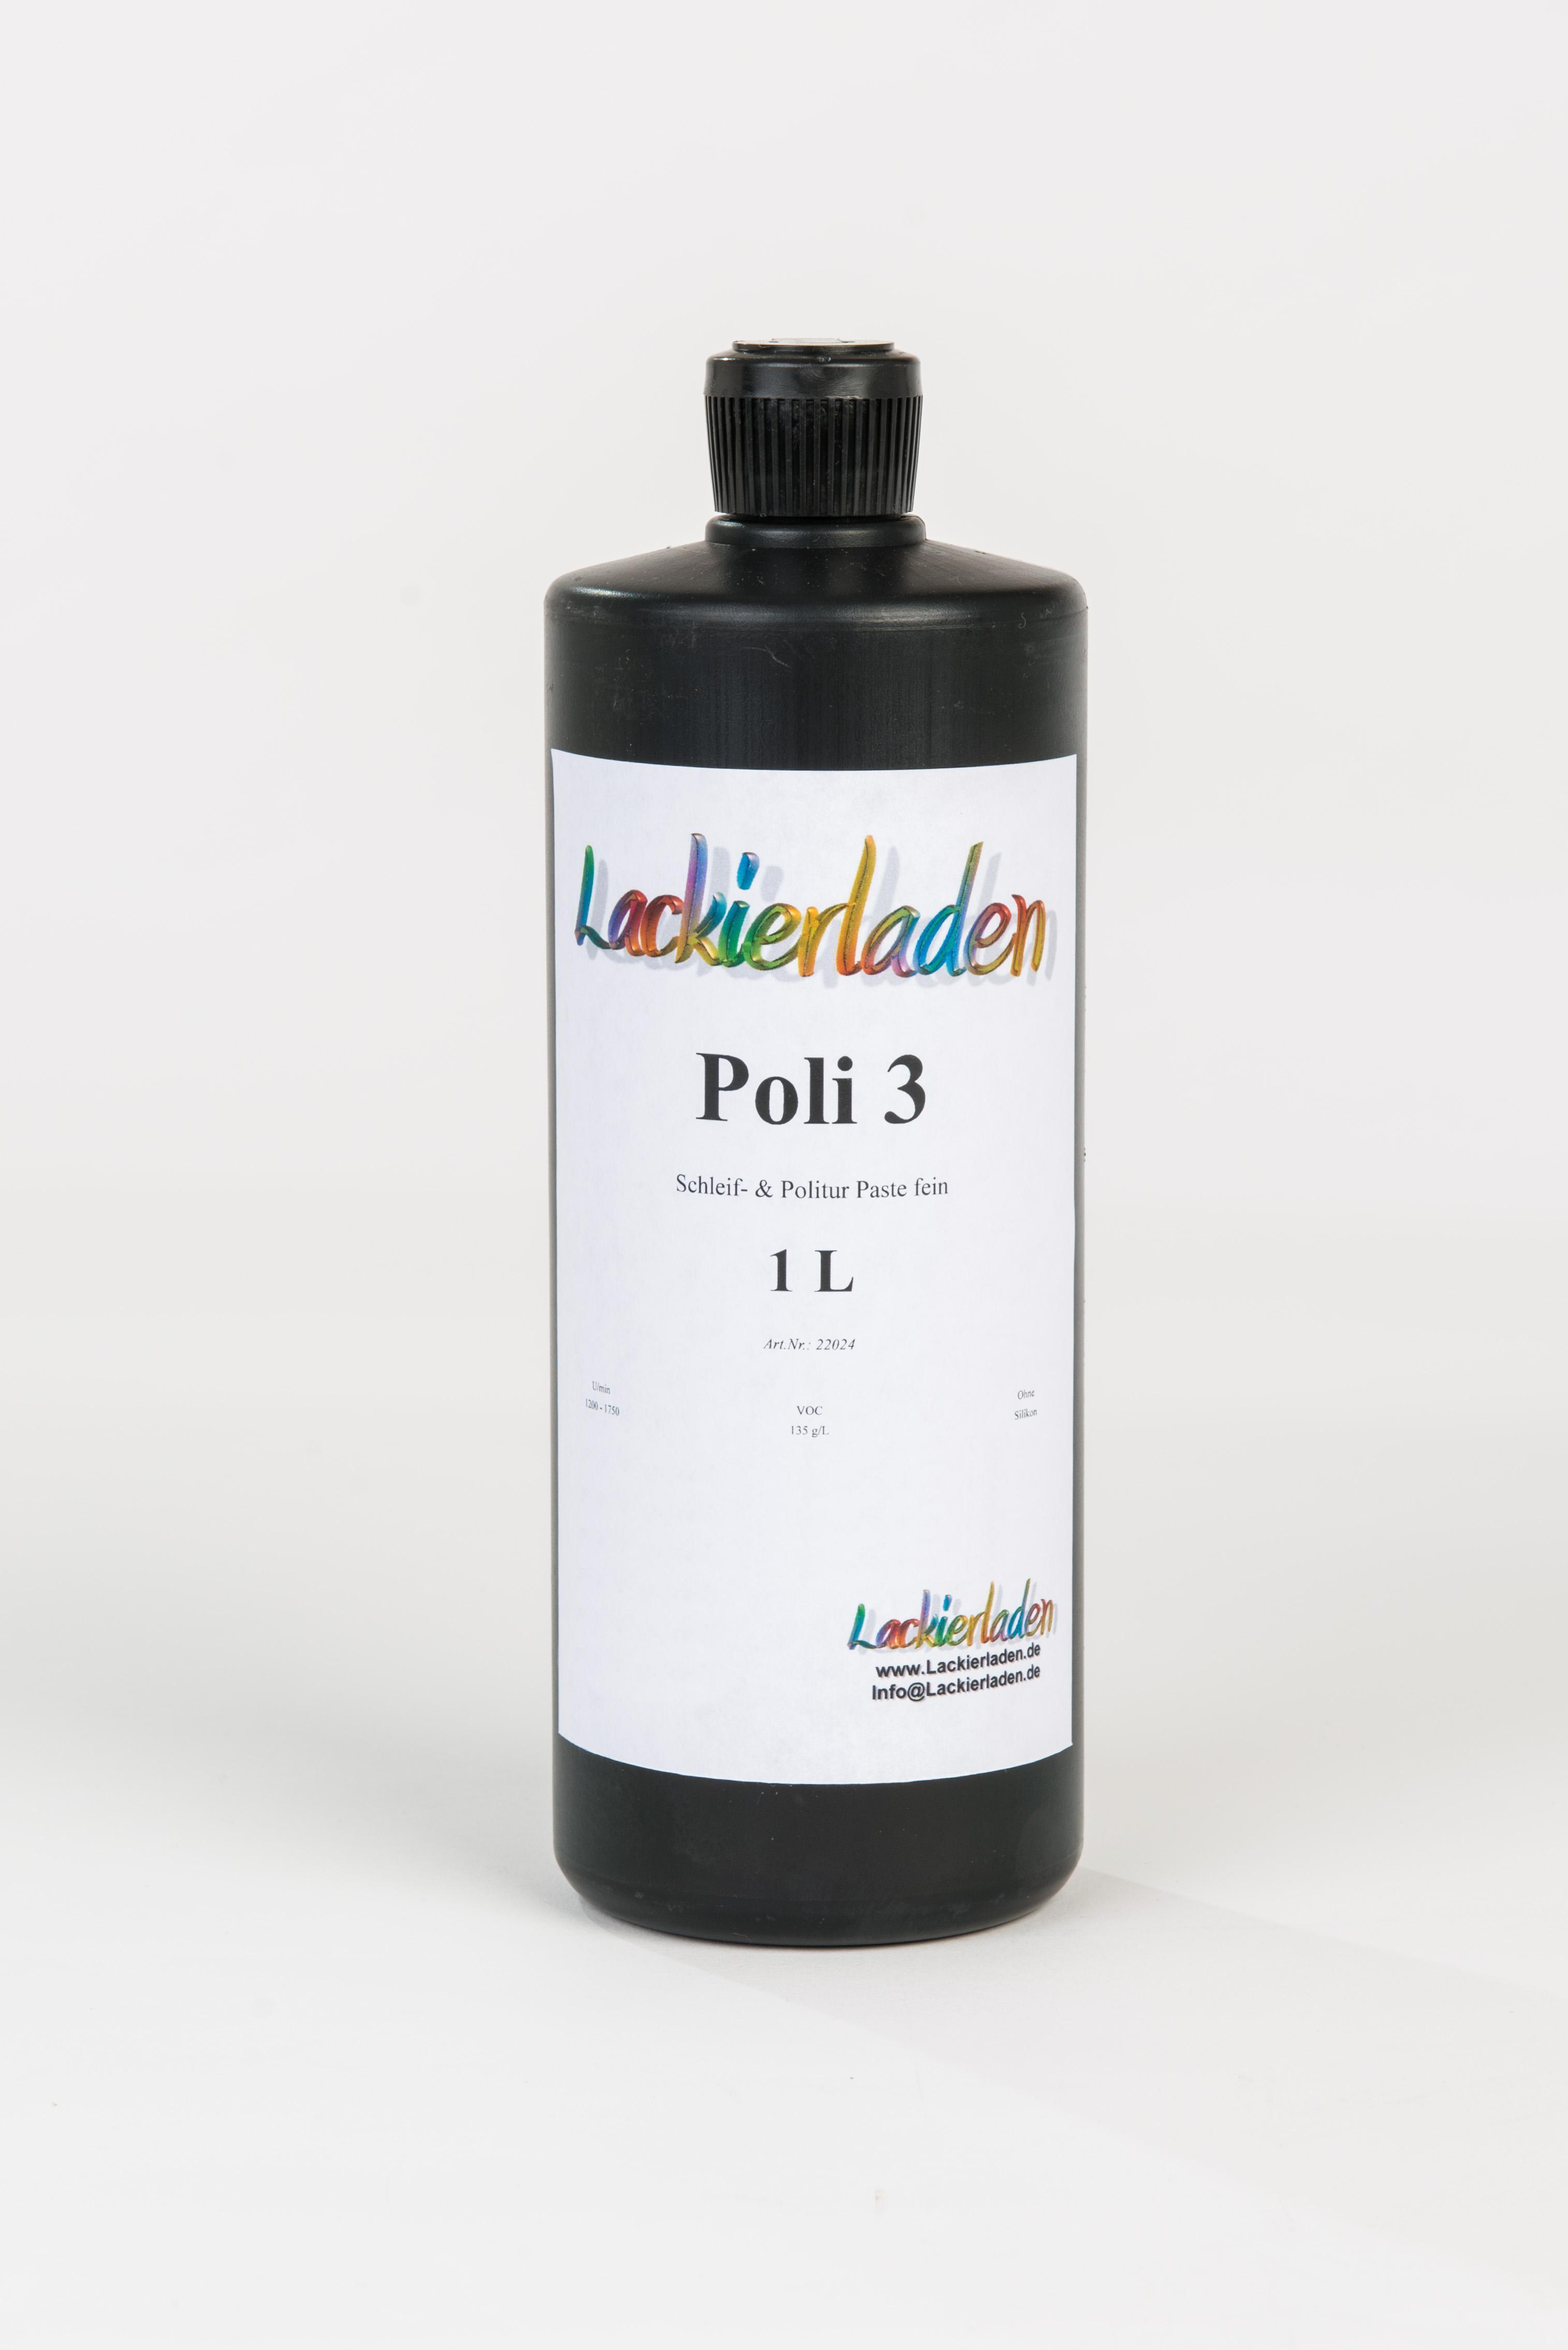 Poli 3 Schleif- & Politur Paste fein 1 L